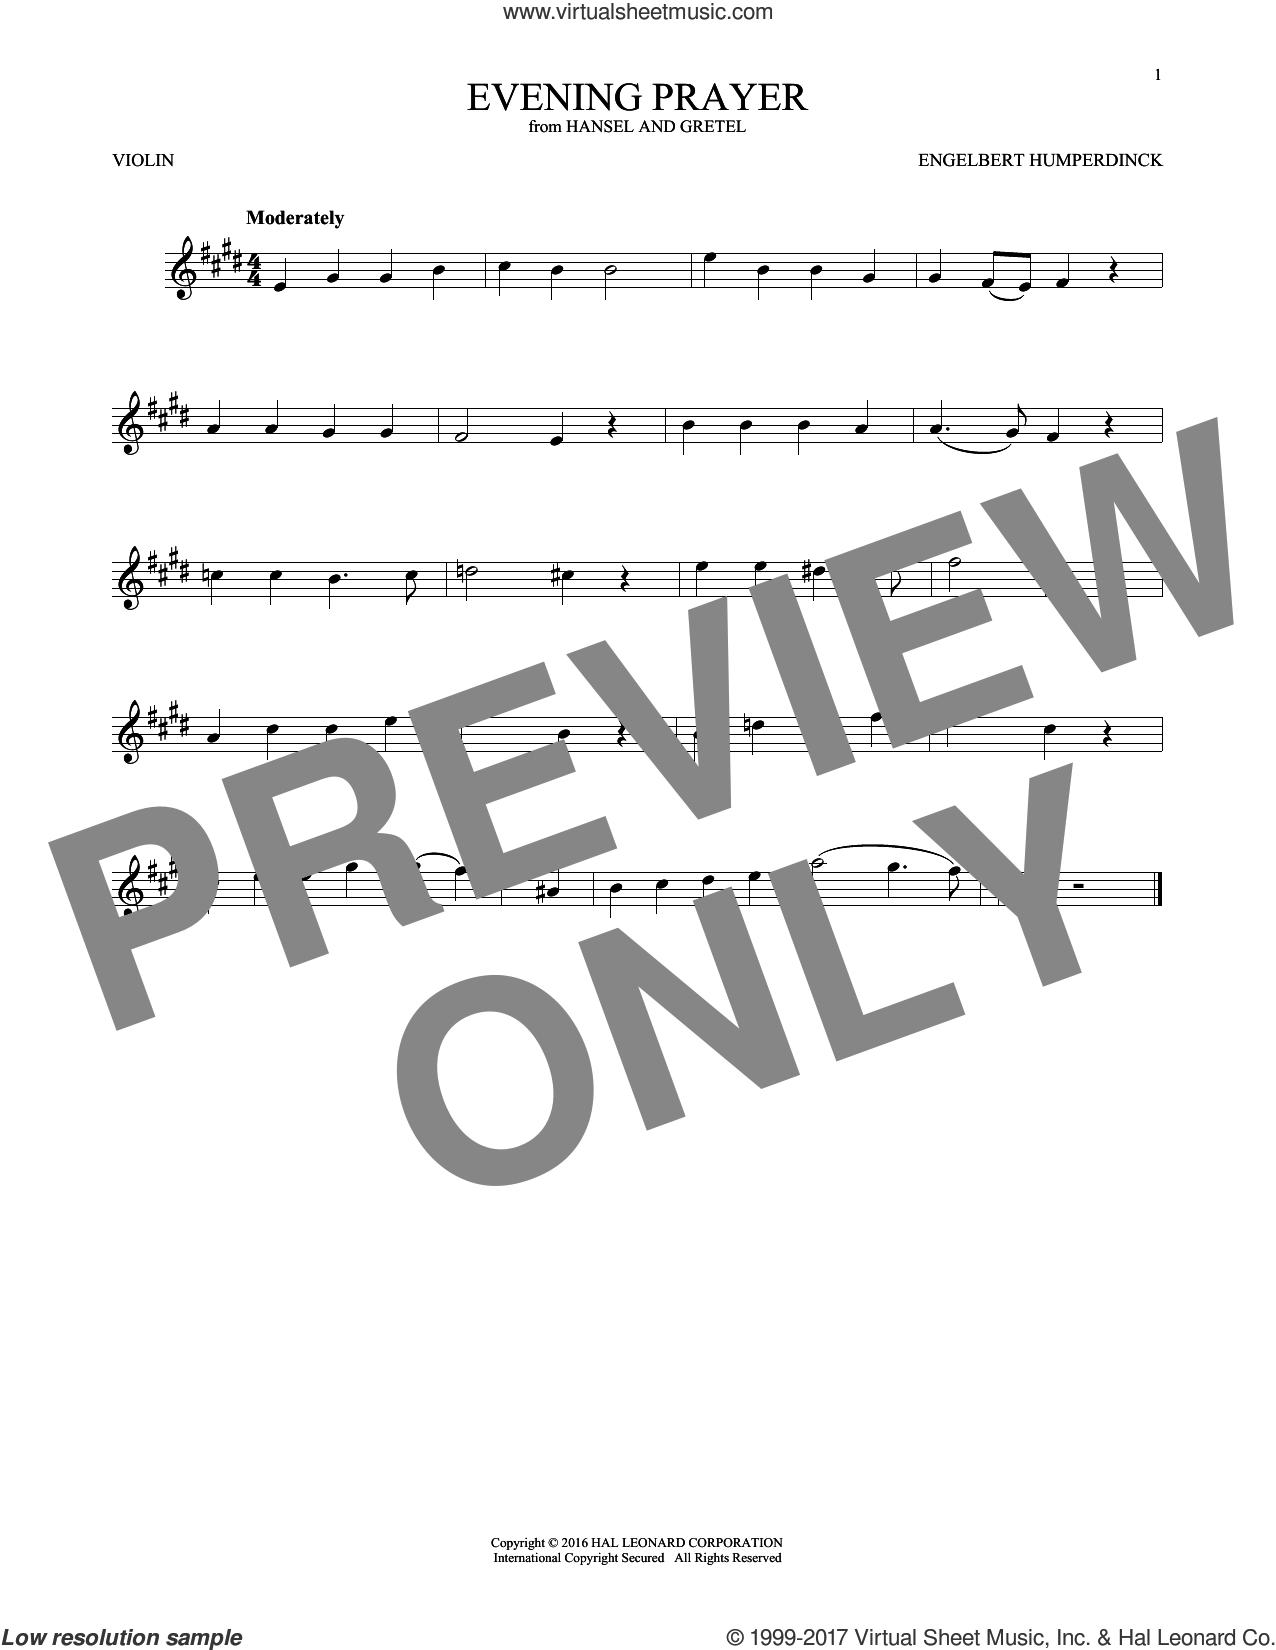 Evening Prayer sheet music for violin solo by Engelbert Humperdinck, intermediate skill level